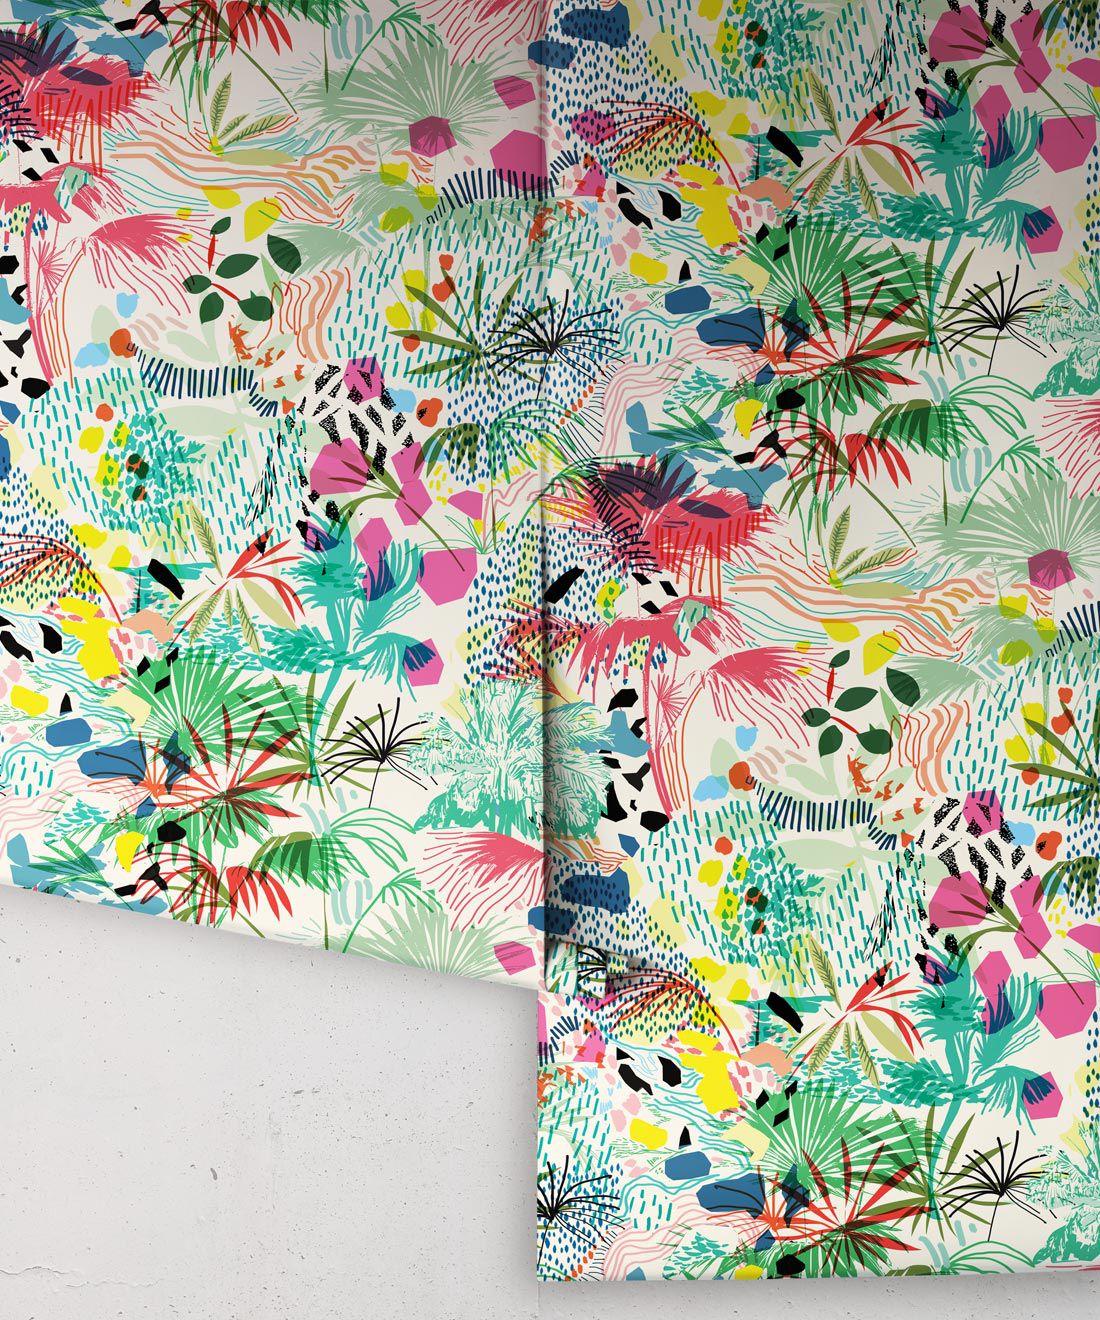 Encinitas Wallpaper • Colorful Floral Wallpaper • Rolls